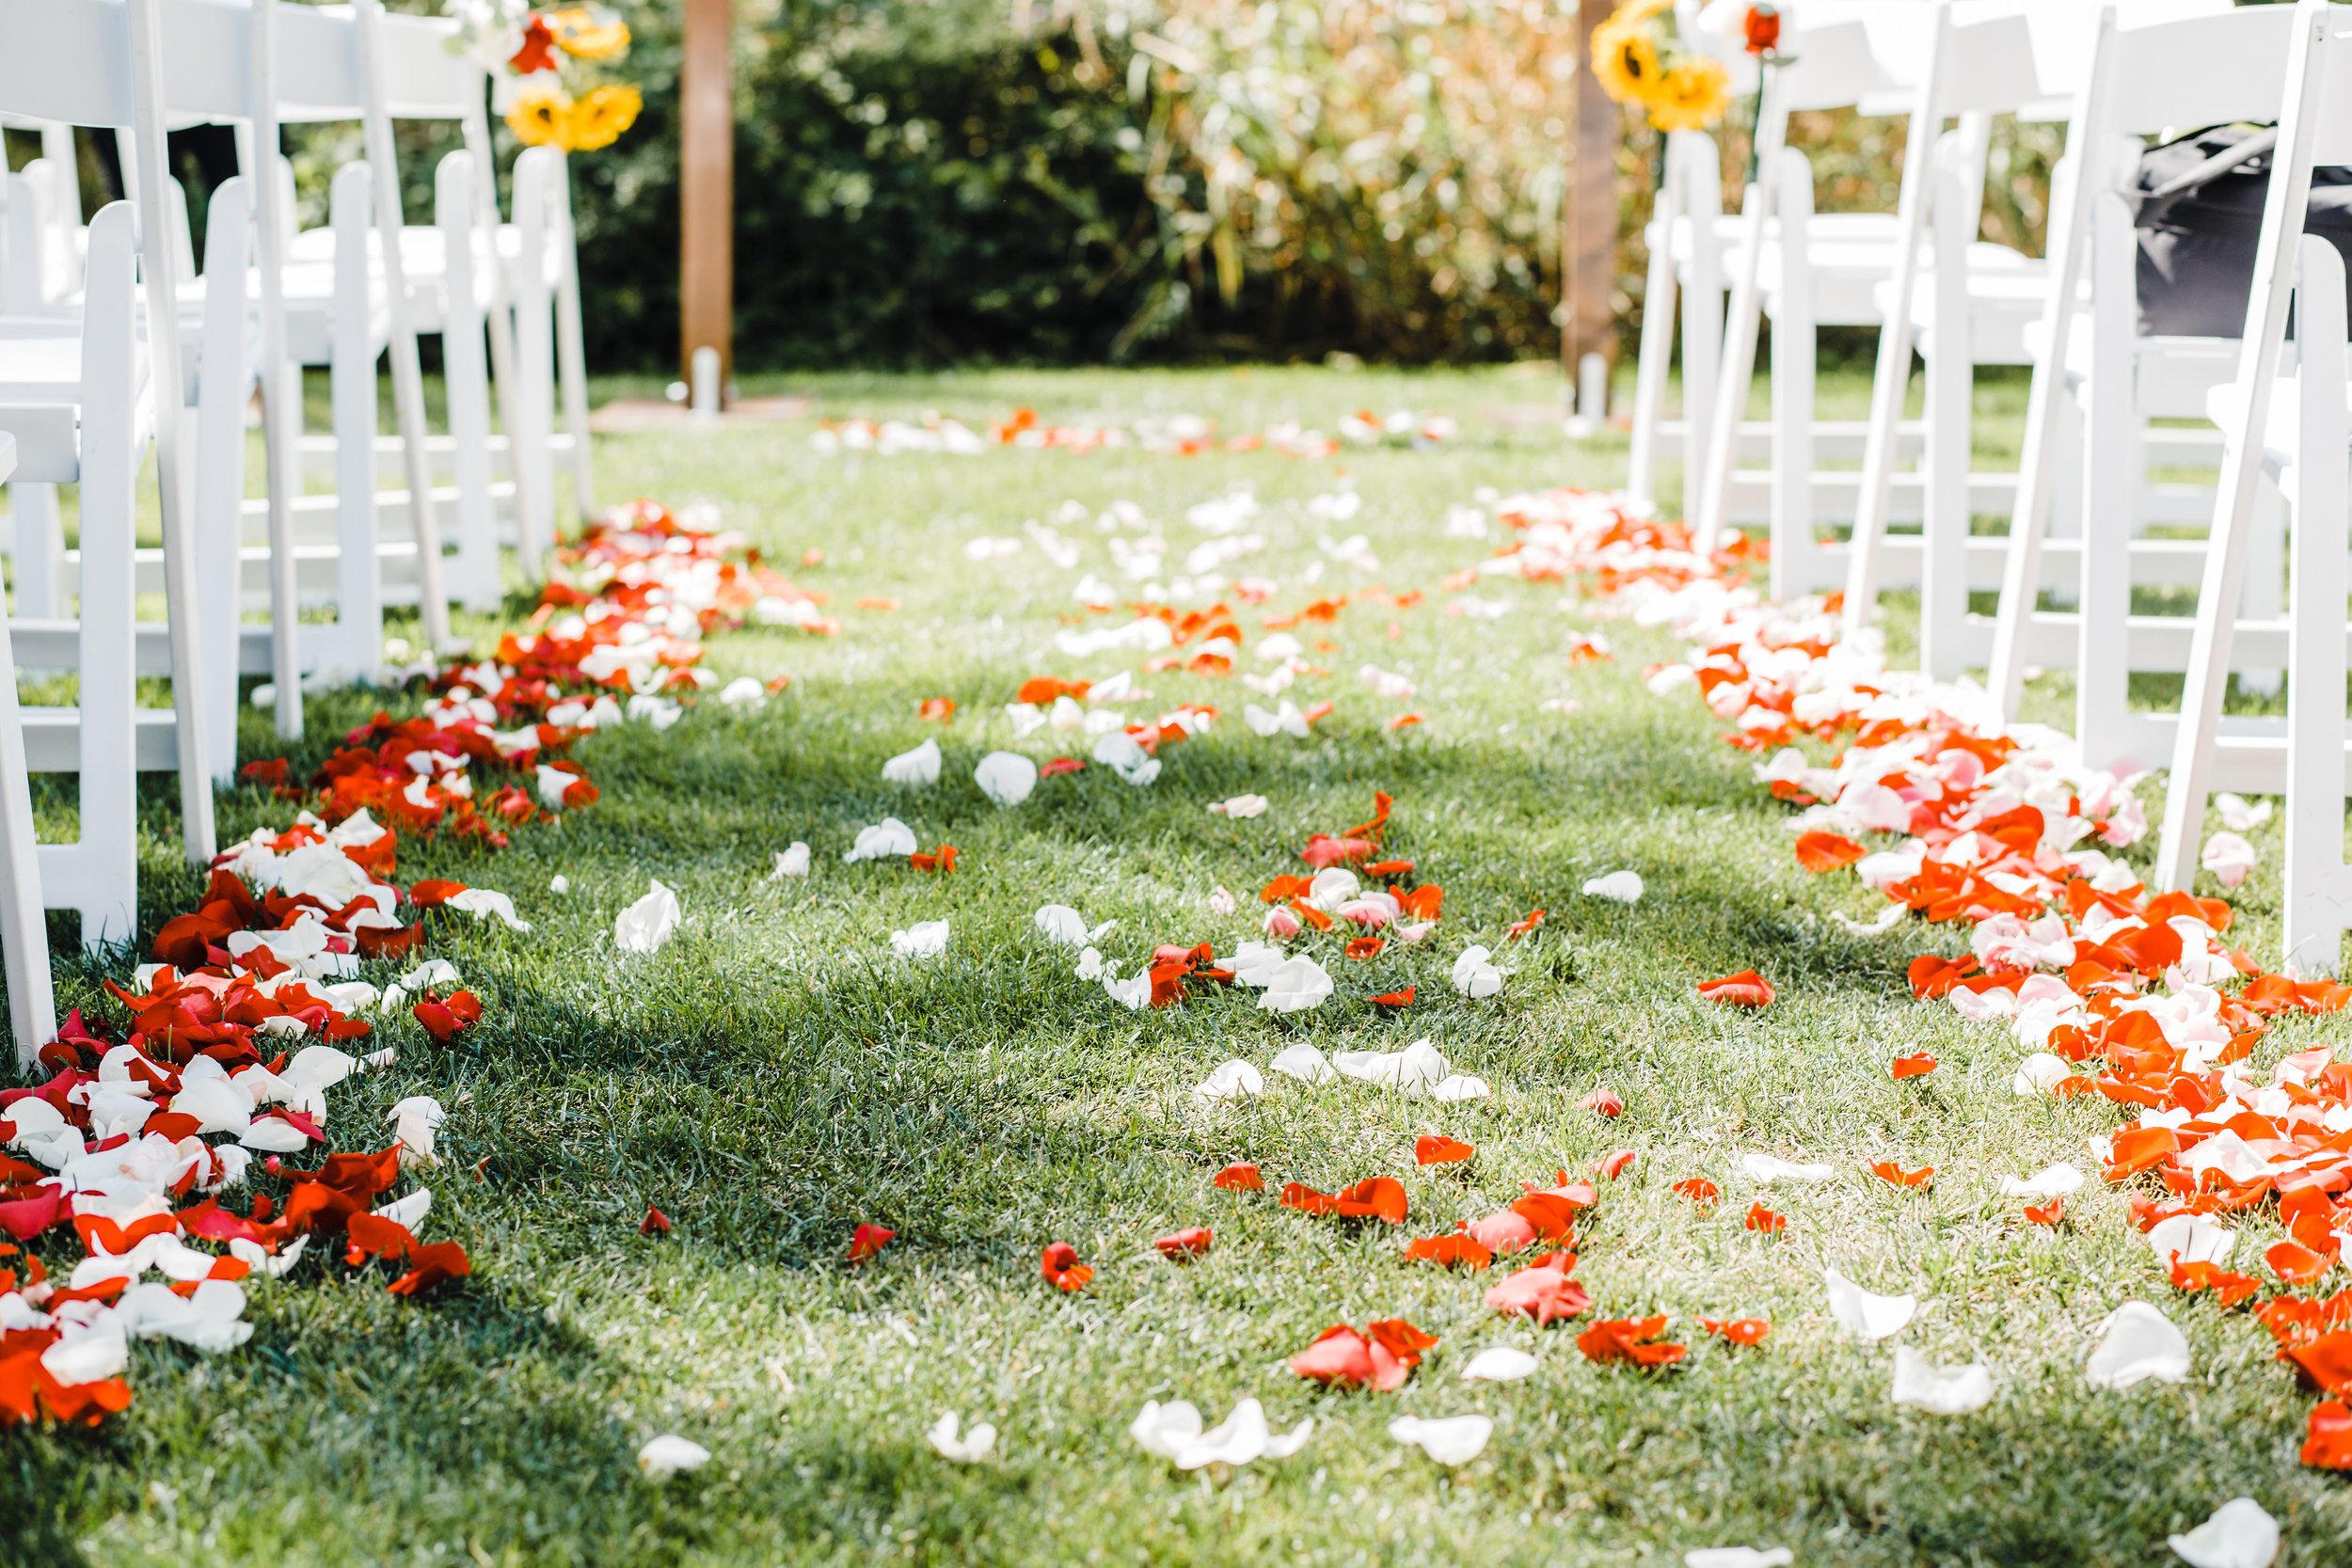 olympia washington professional wedding photographer wedding isle rose petals outdoor ceremony